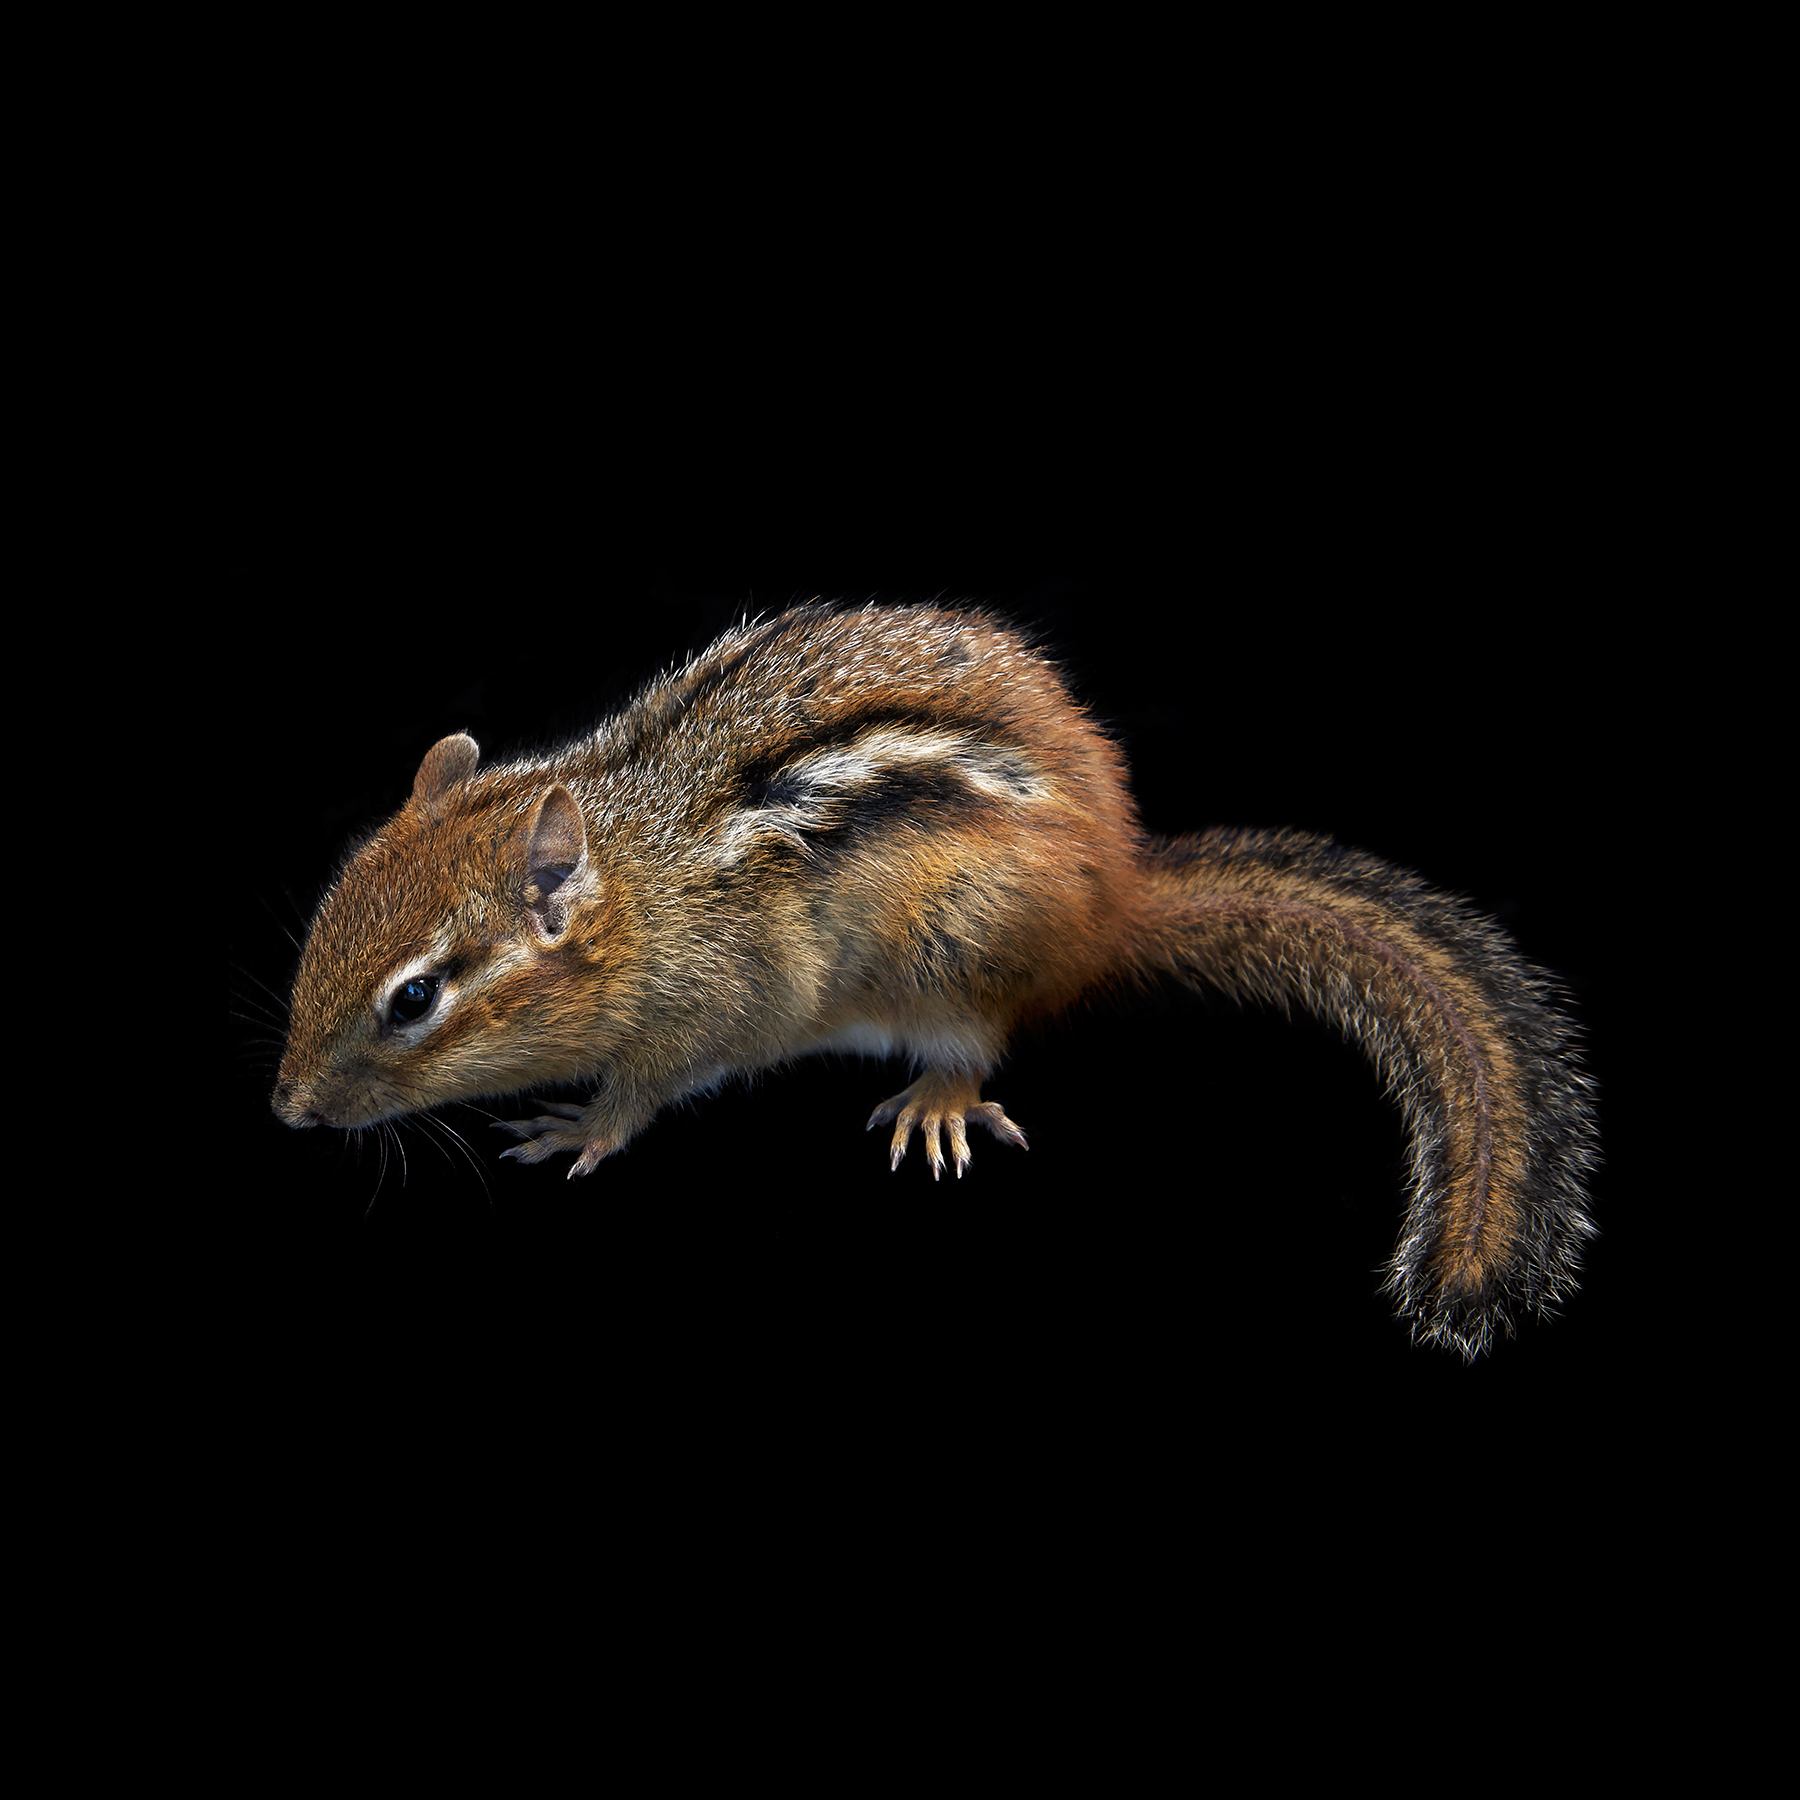 CHIPMONK-RODENT-ANIMAL-©-JONATHAN-R.-BECKERMAN-PHOTOGRAPHY.jpg